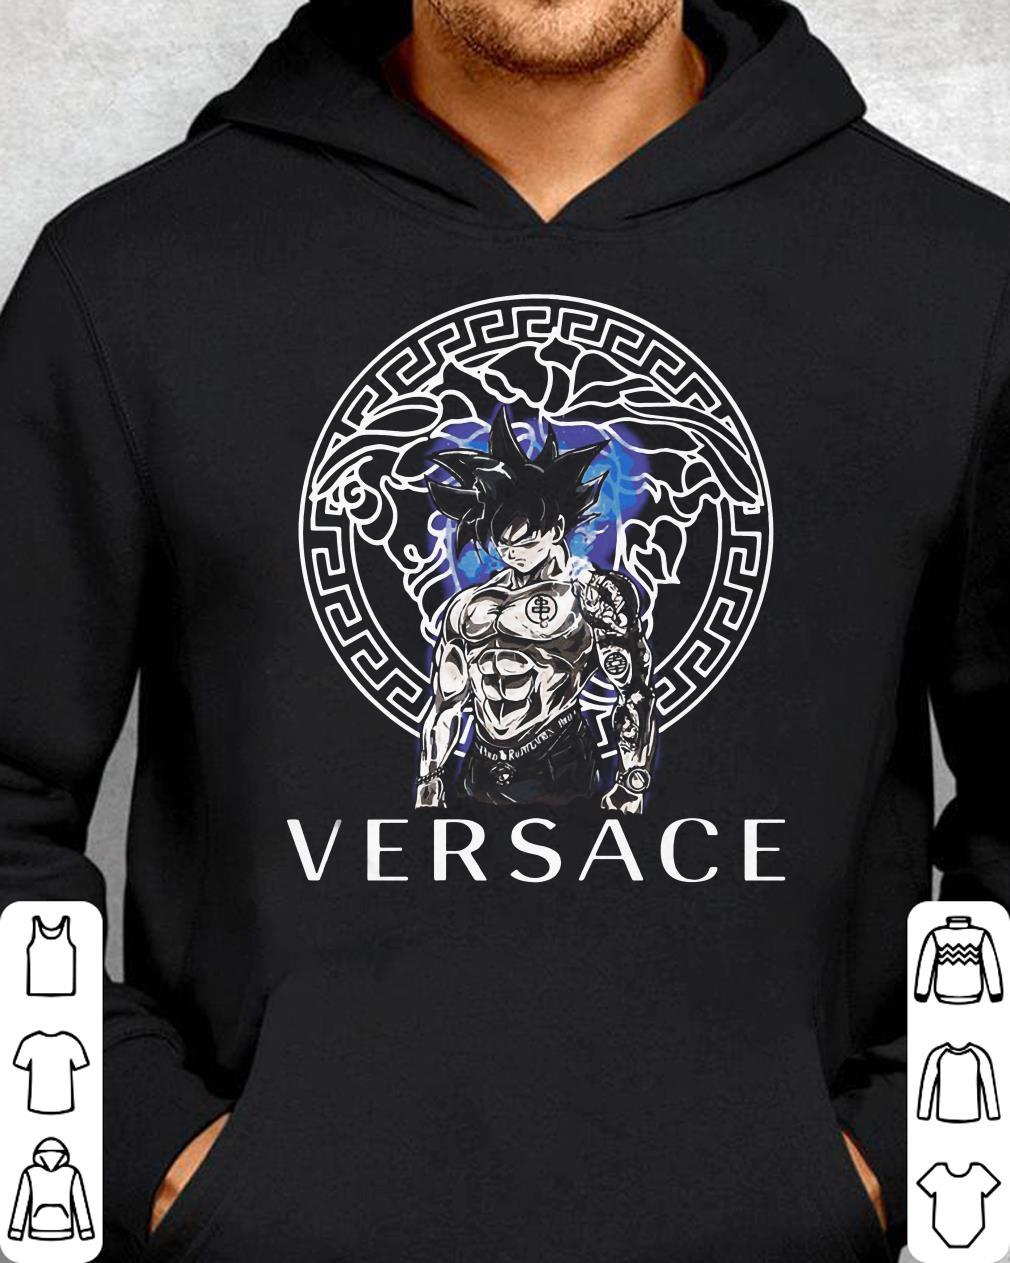 58e17848 Dragon Ball Super Son Goku Ultra instinct Versace shirt, hoodie, sweater  sweatshirt, long-sleeve For Men and Women